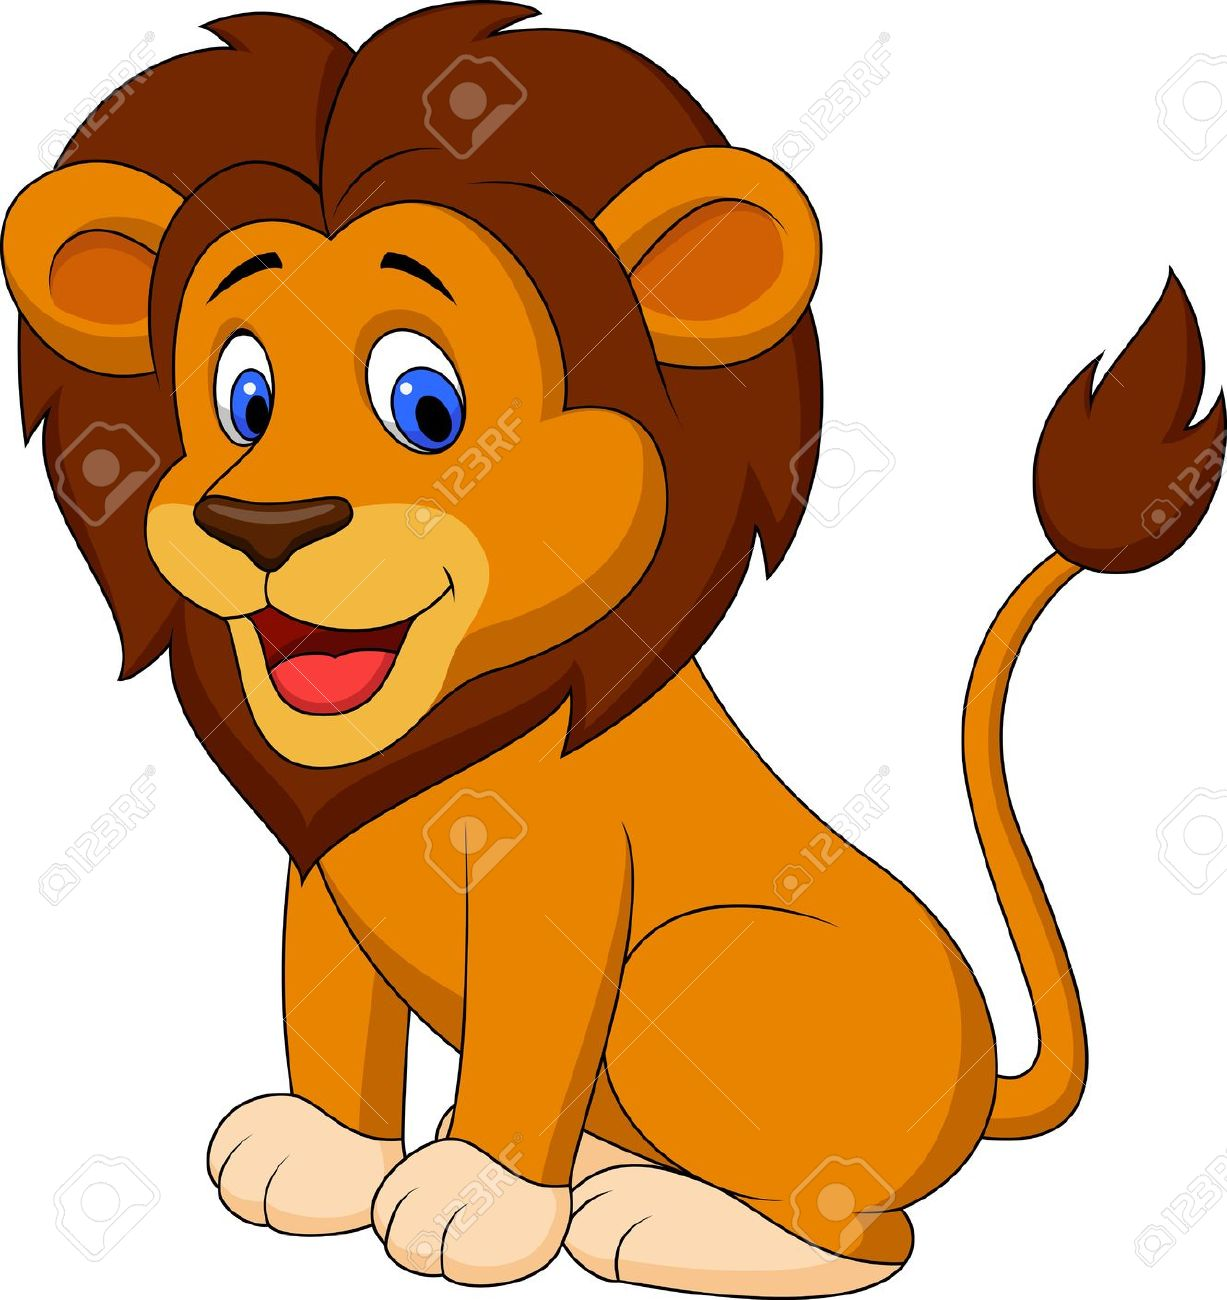 1227x1300 Lion Clipart Cartoon